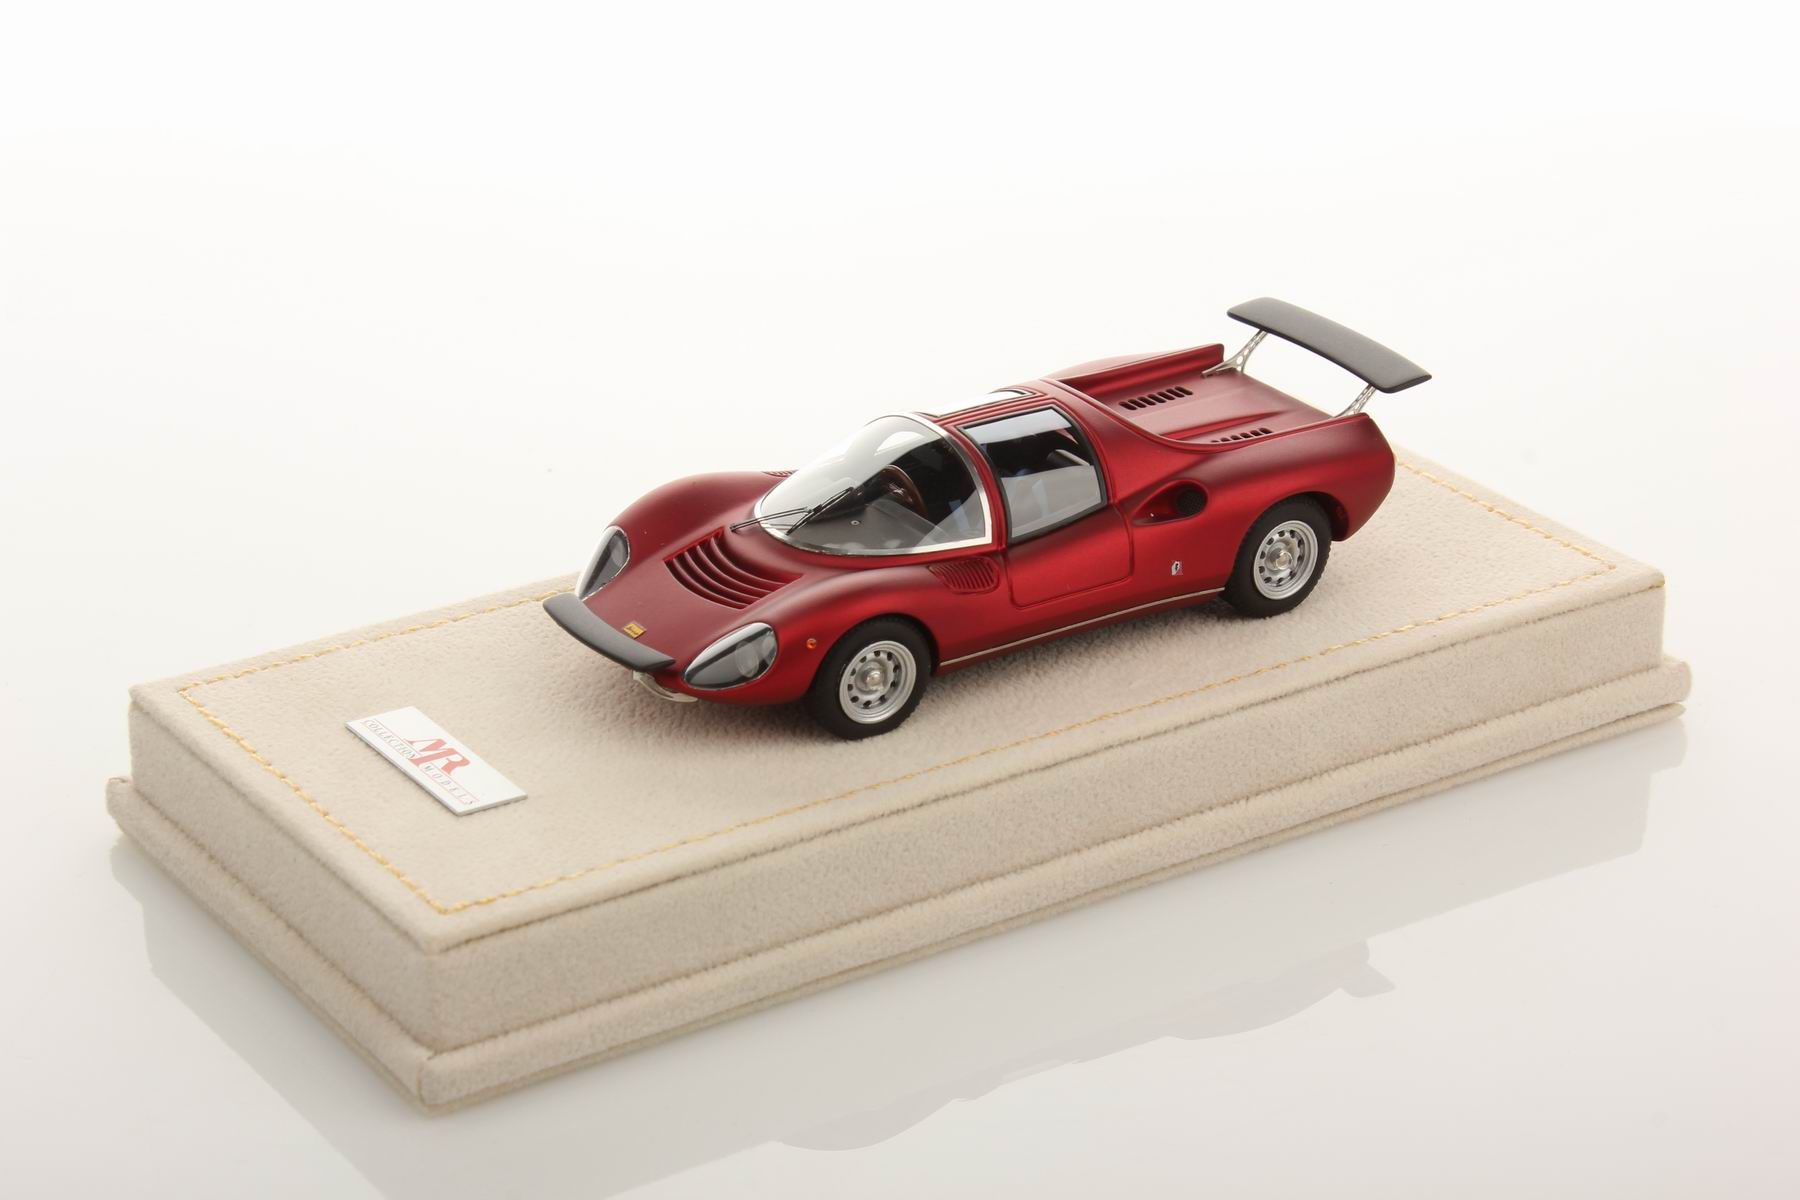 ferrari dino 206s prototype 1 43 mr collection models. Black Bedroom Furniture Sets. Home Design Ideas